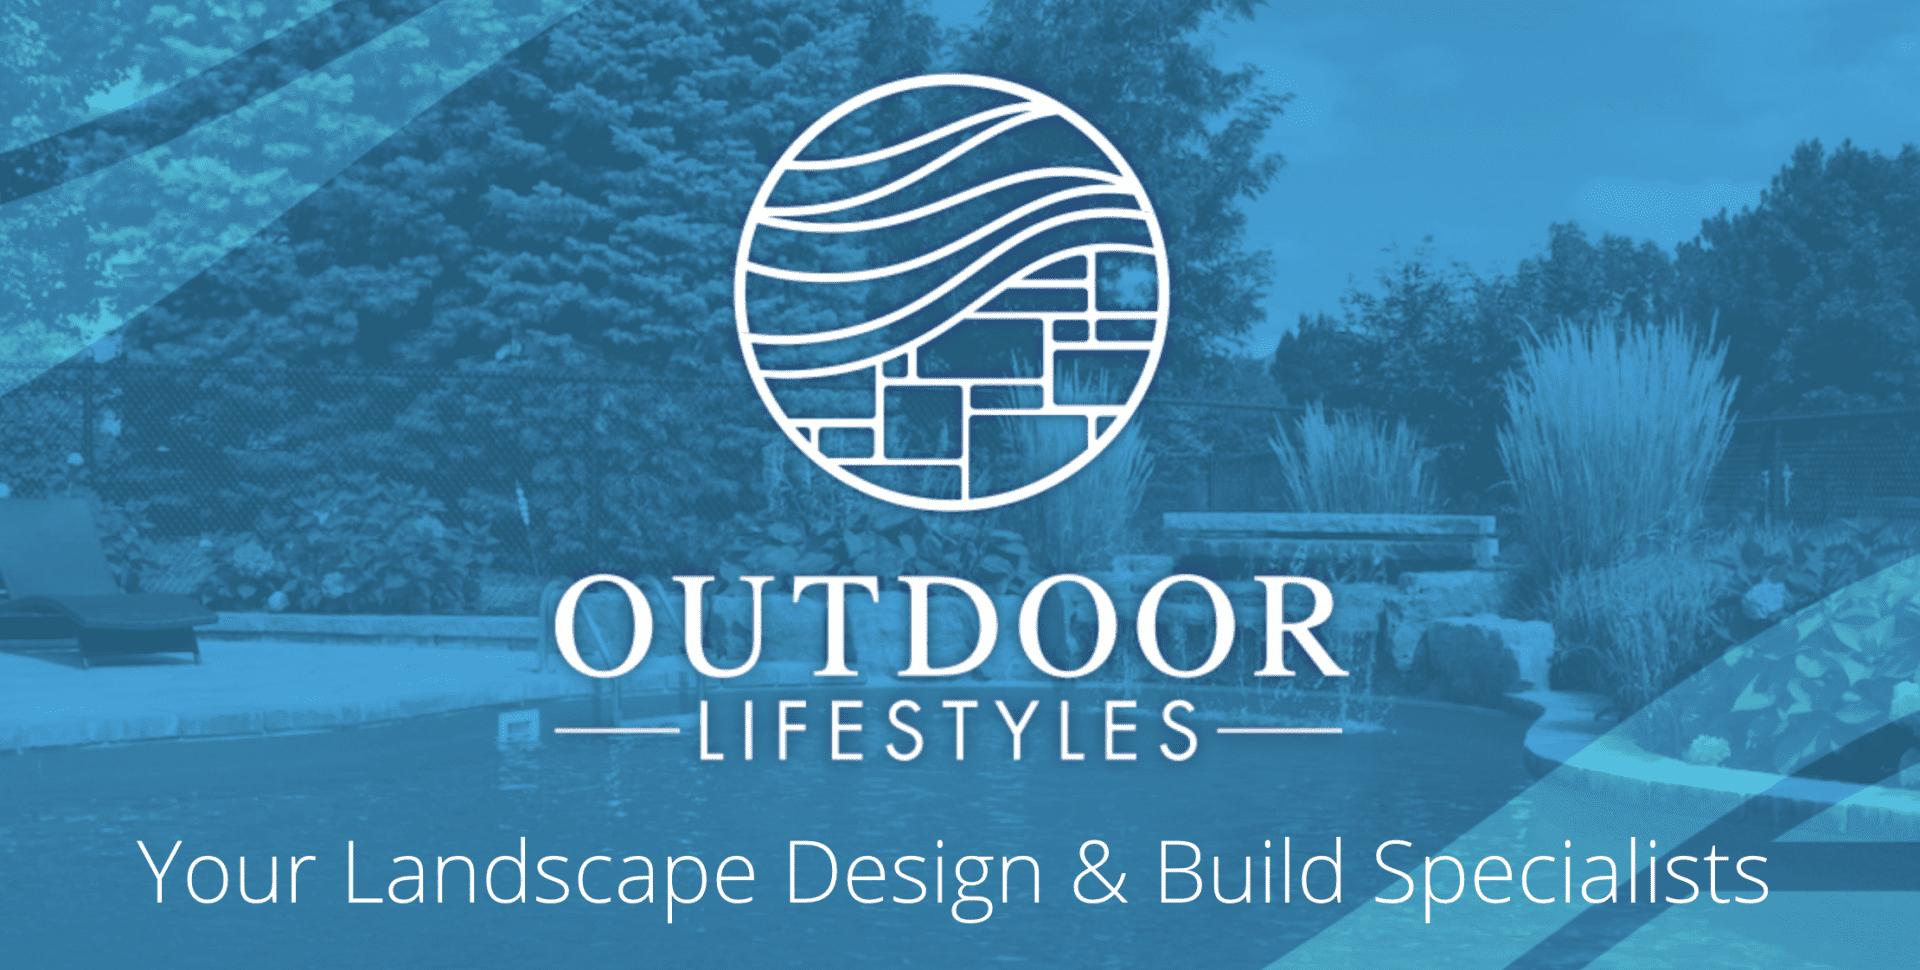 Landscape Design Principles With Outdoor Lifestyles Deborah